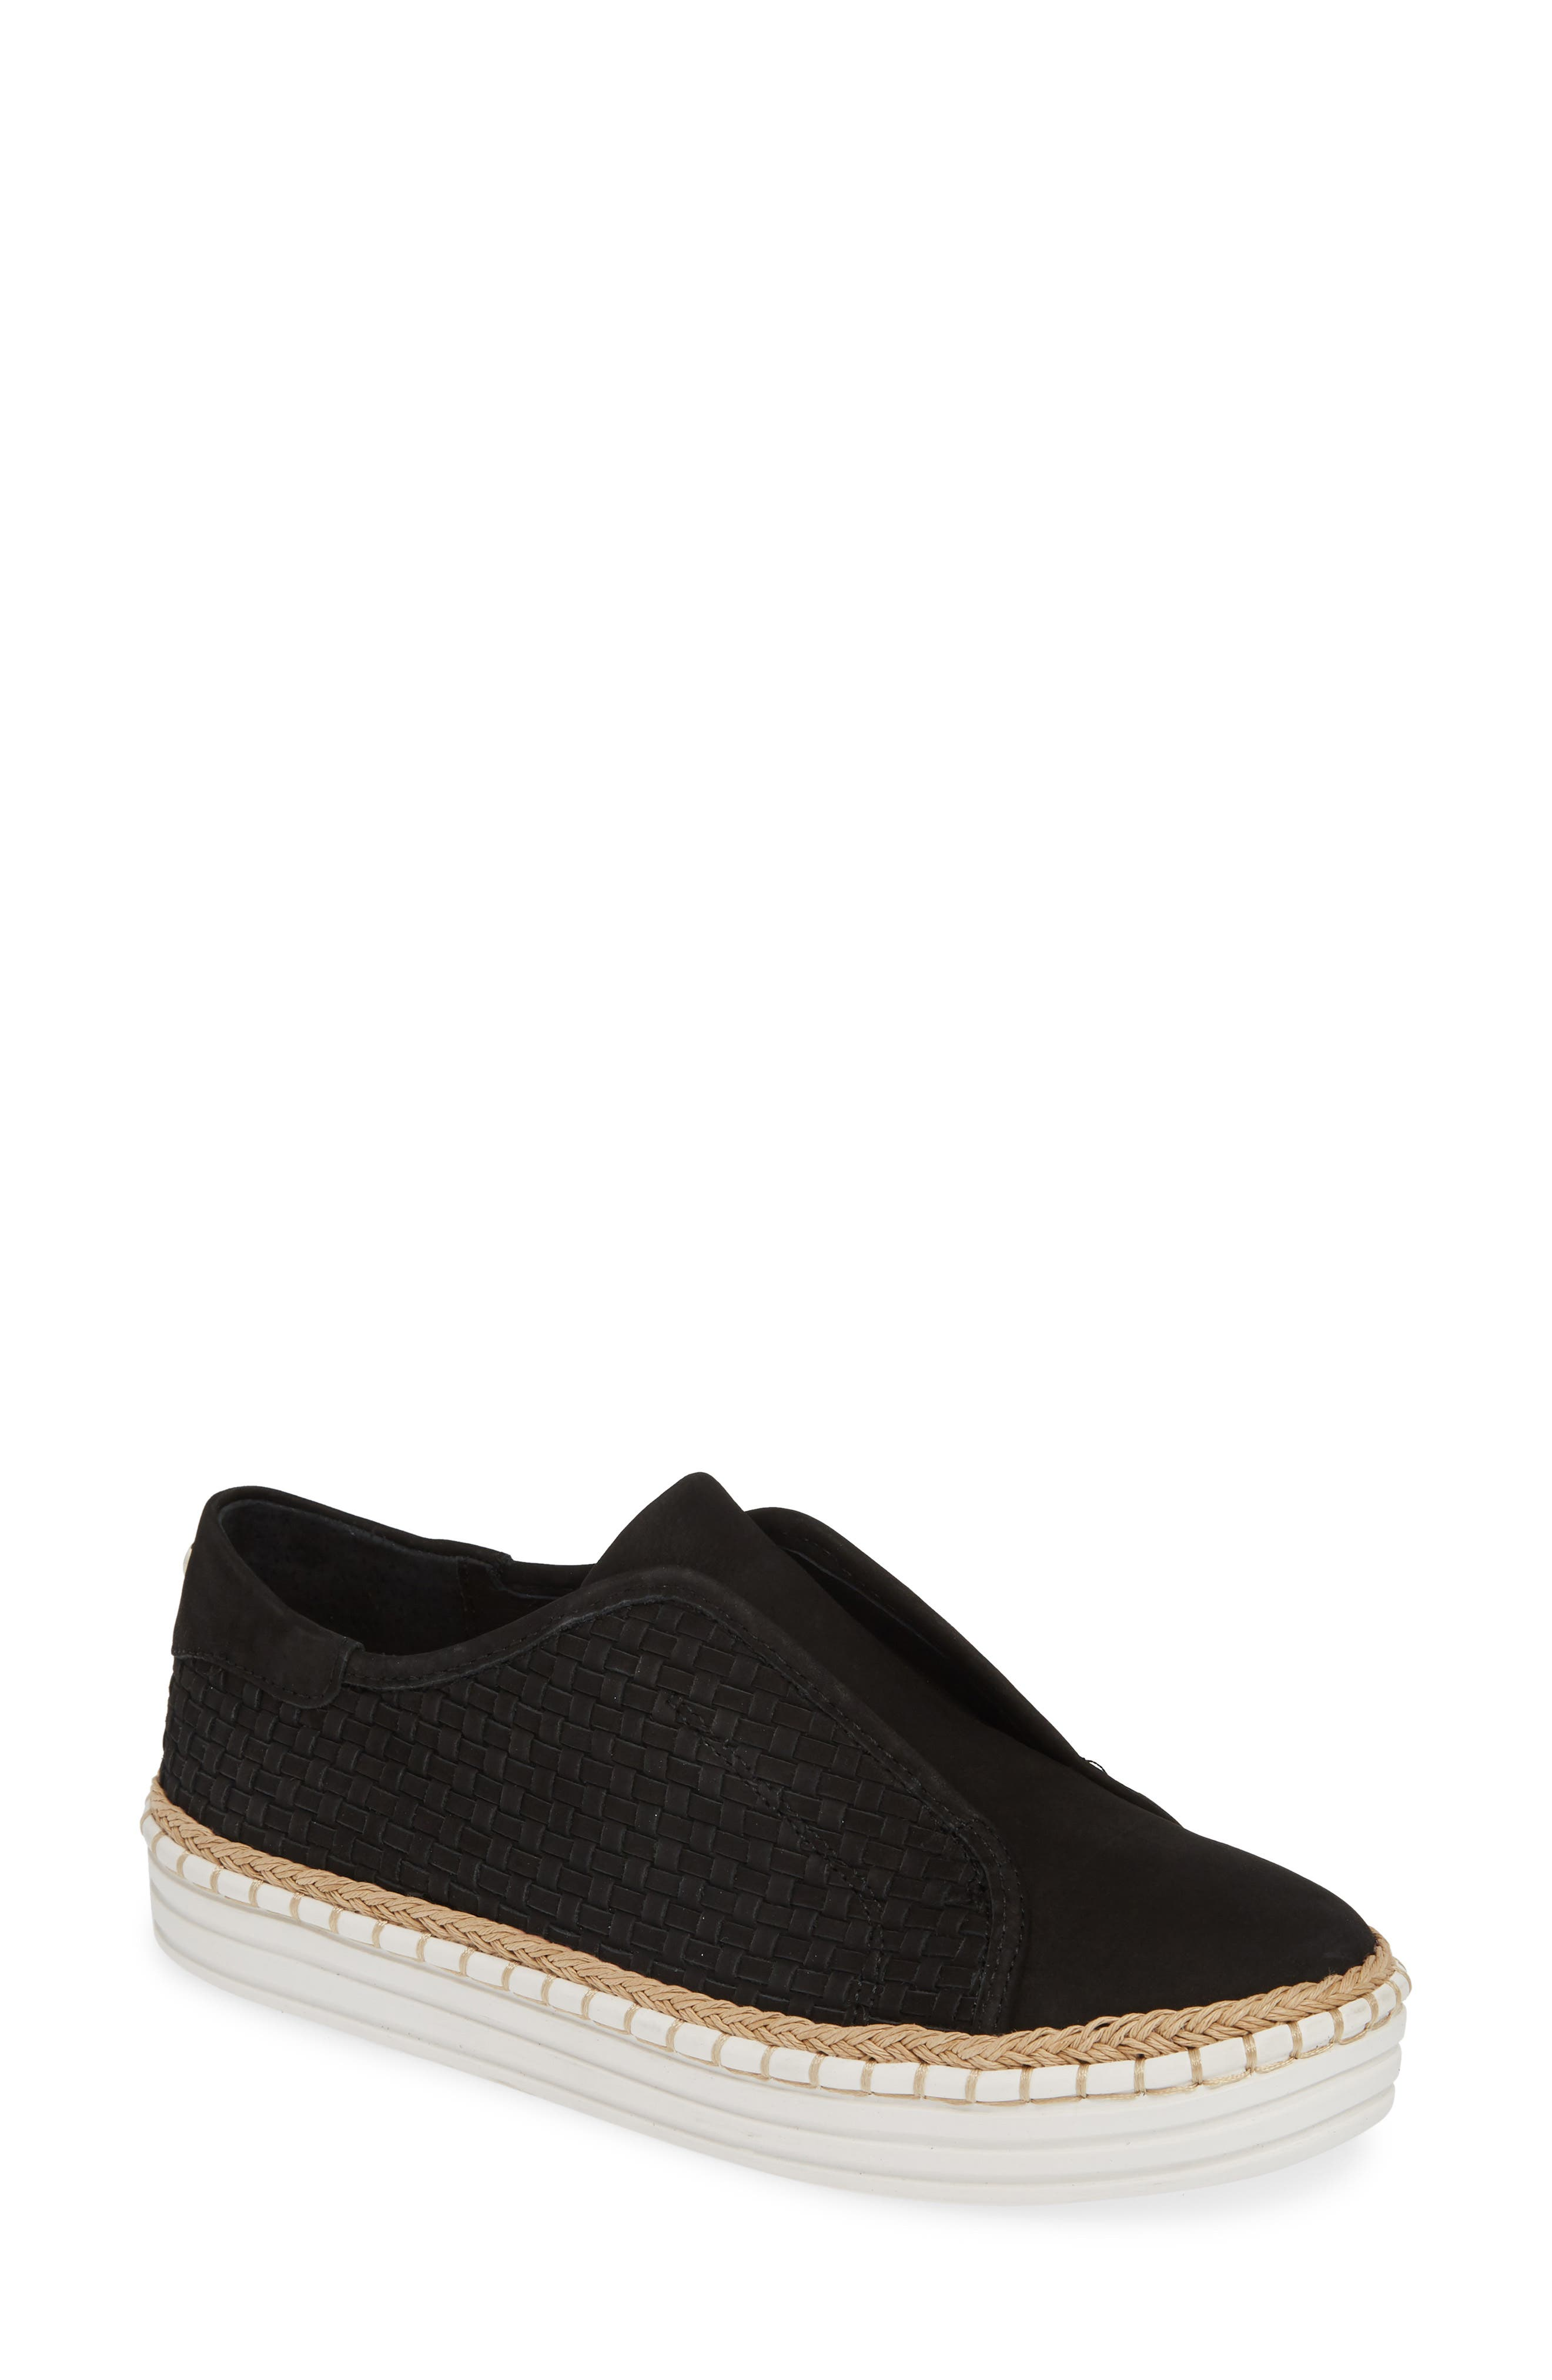 Jslides Kayla Slip-On Sneaker, Black